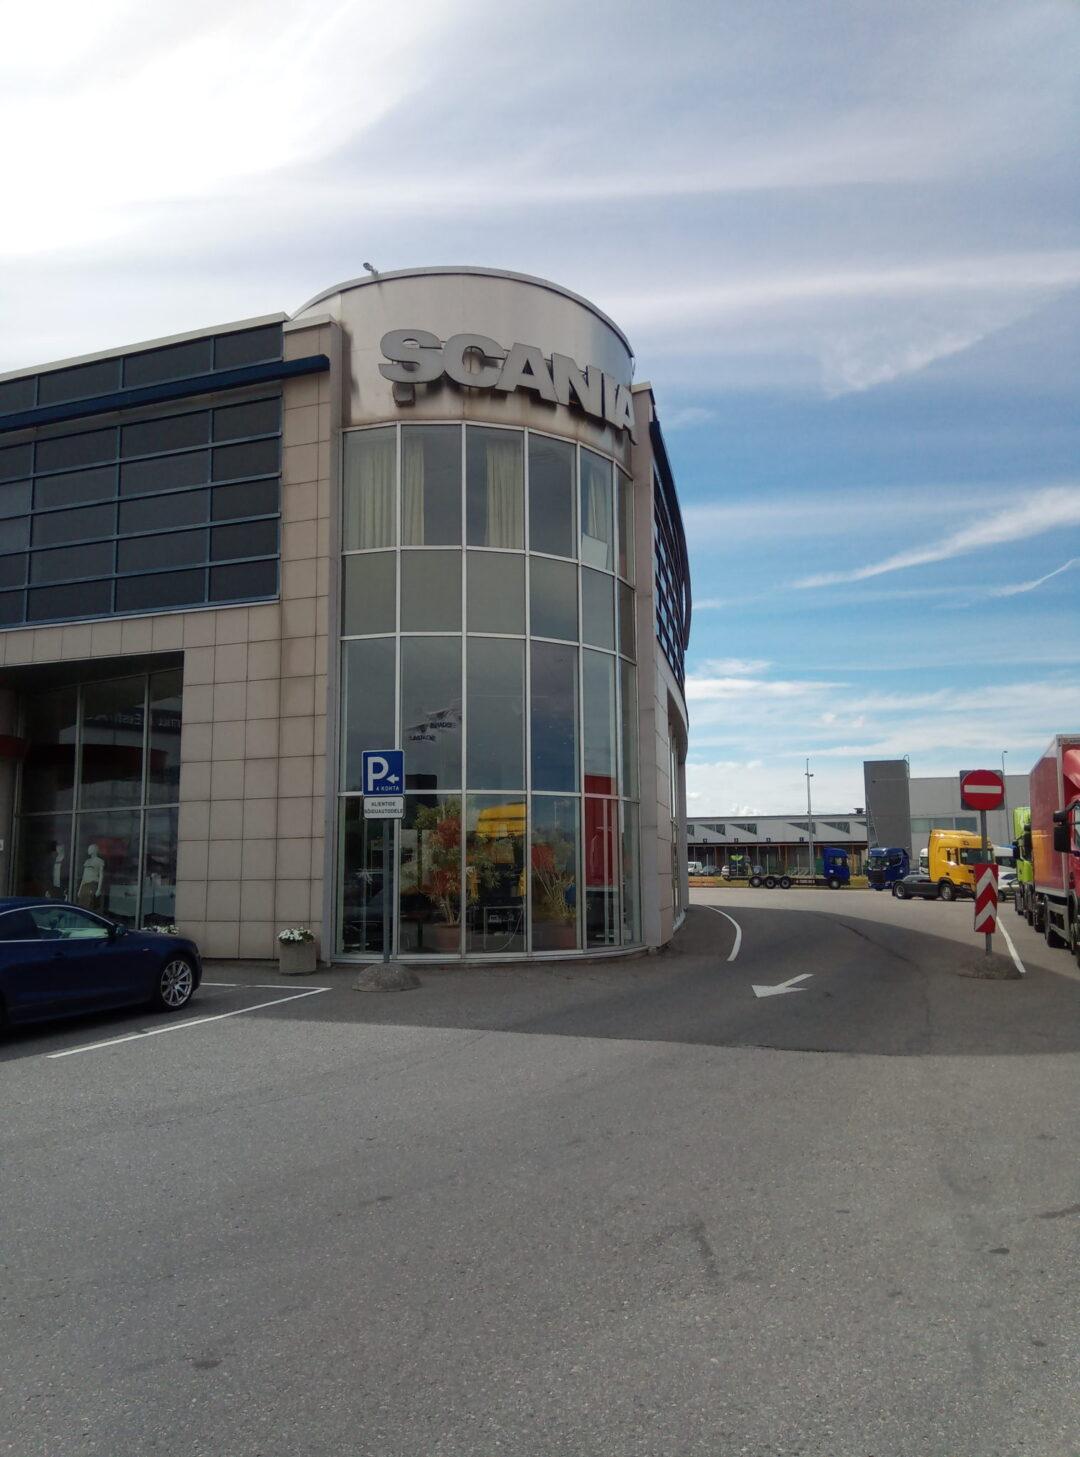 Scania bürooruumide remont